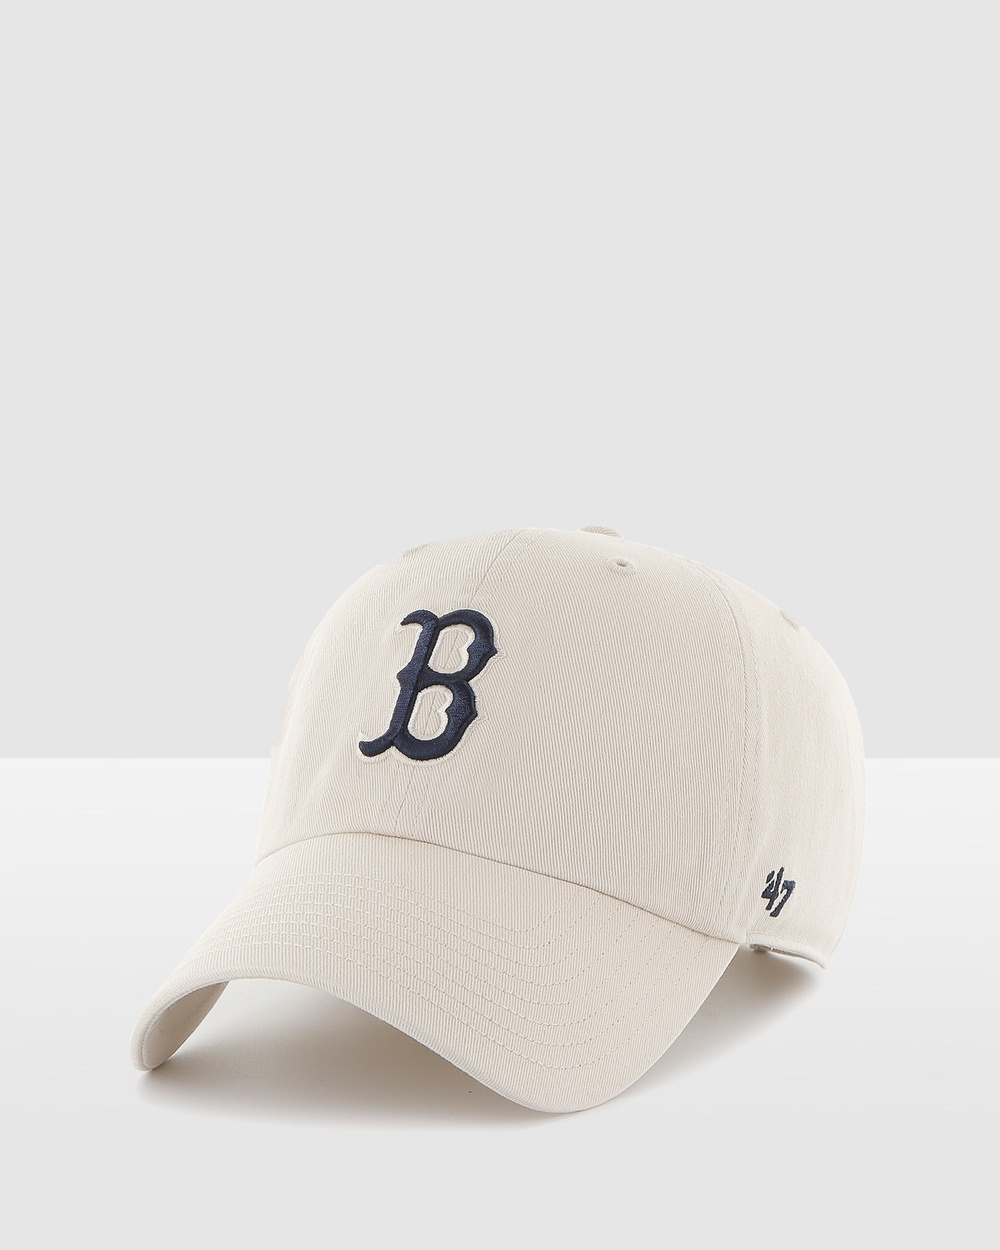 47 Boston Red Sox Bone Navy '47 CLEAN UP Headwear Nude Bone-Navy